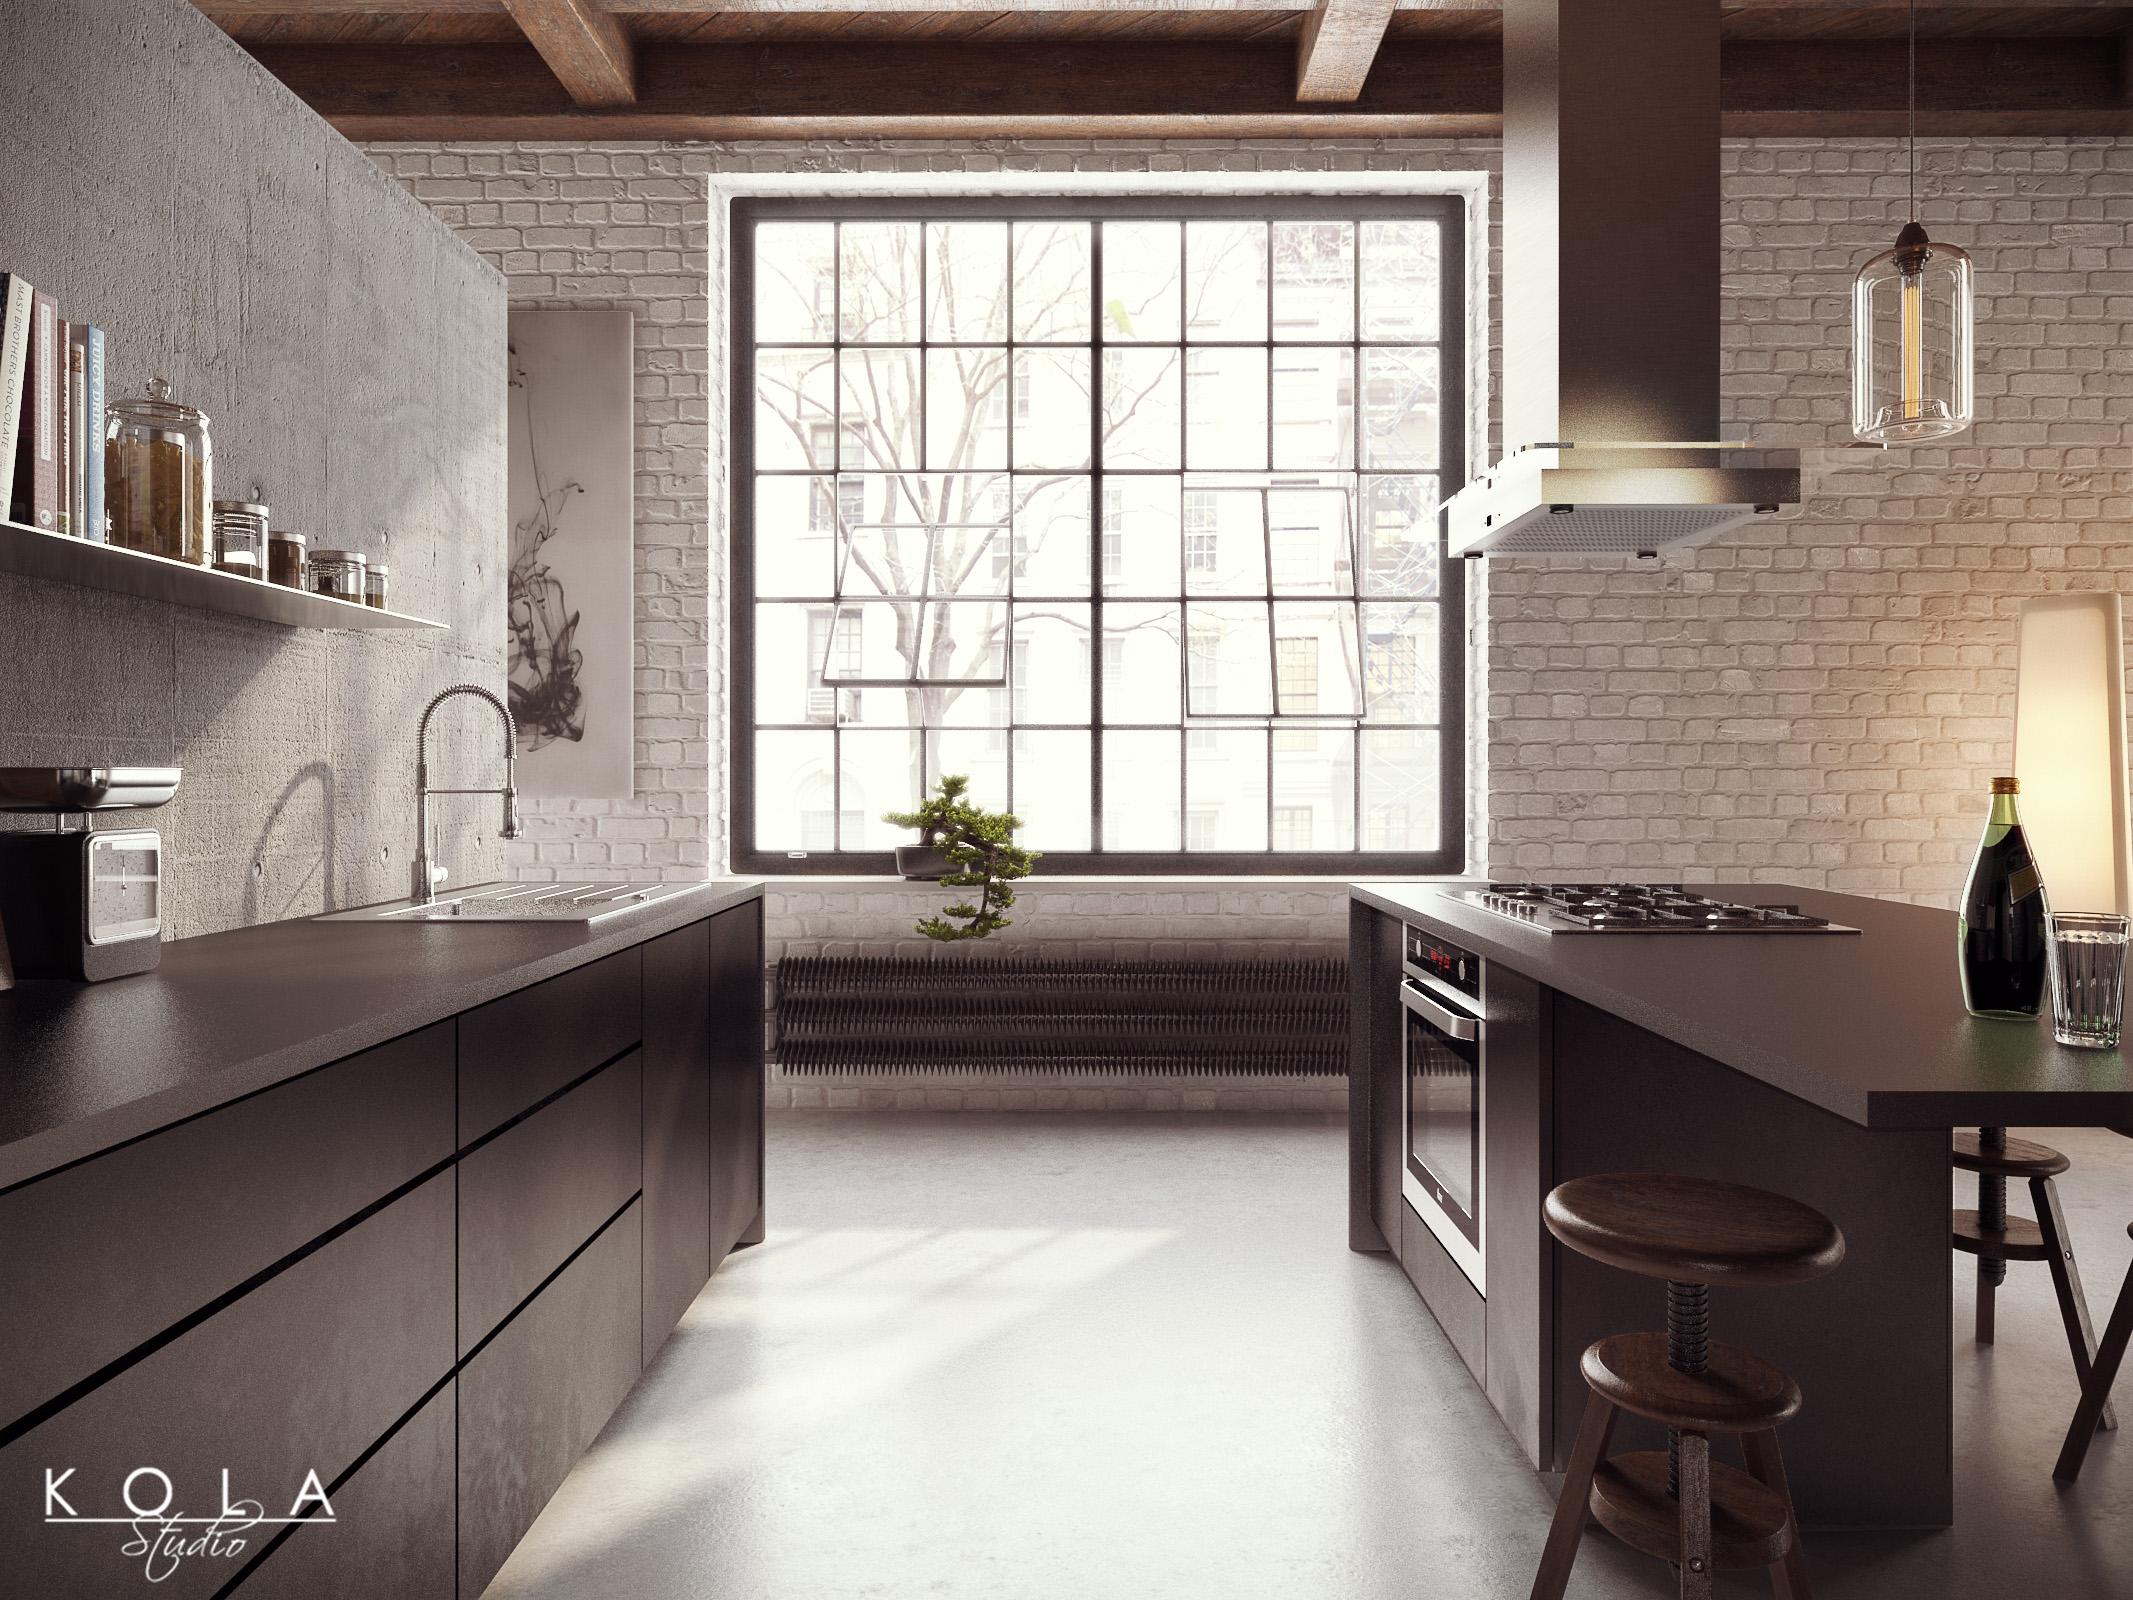 Visualization Of A Loft Kitchen 3D Model   Industrial Style Kitchen